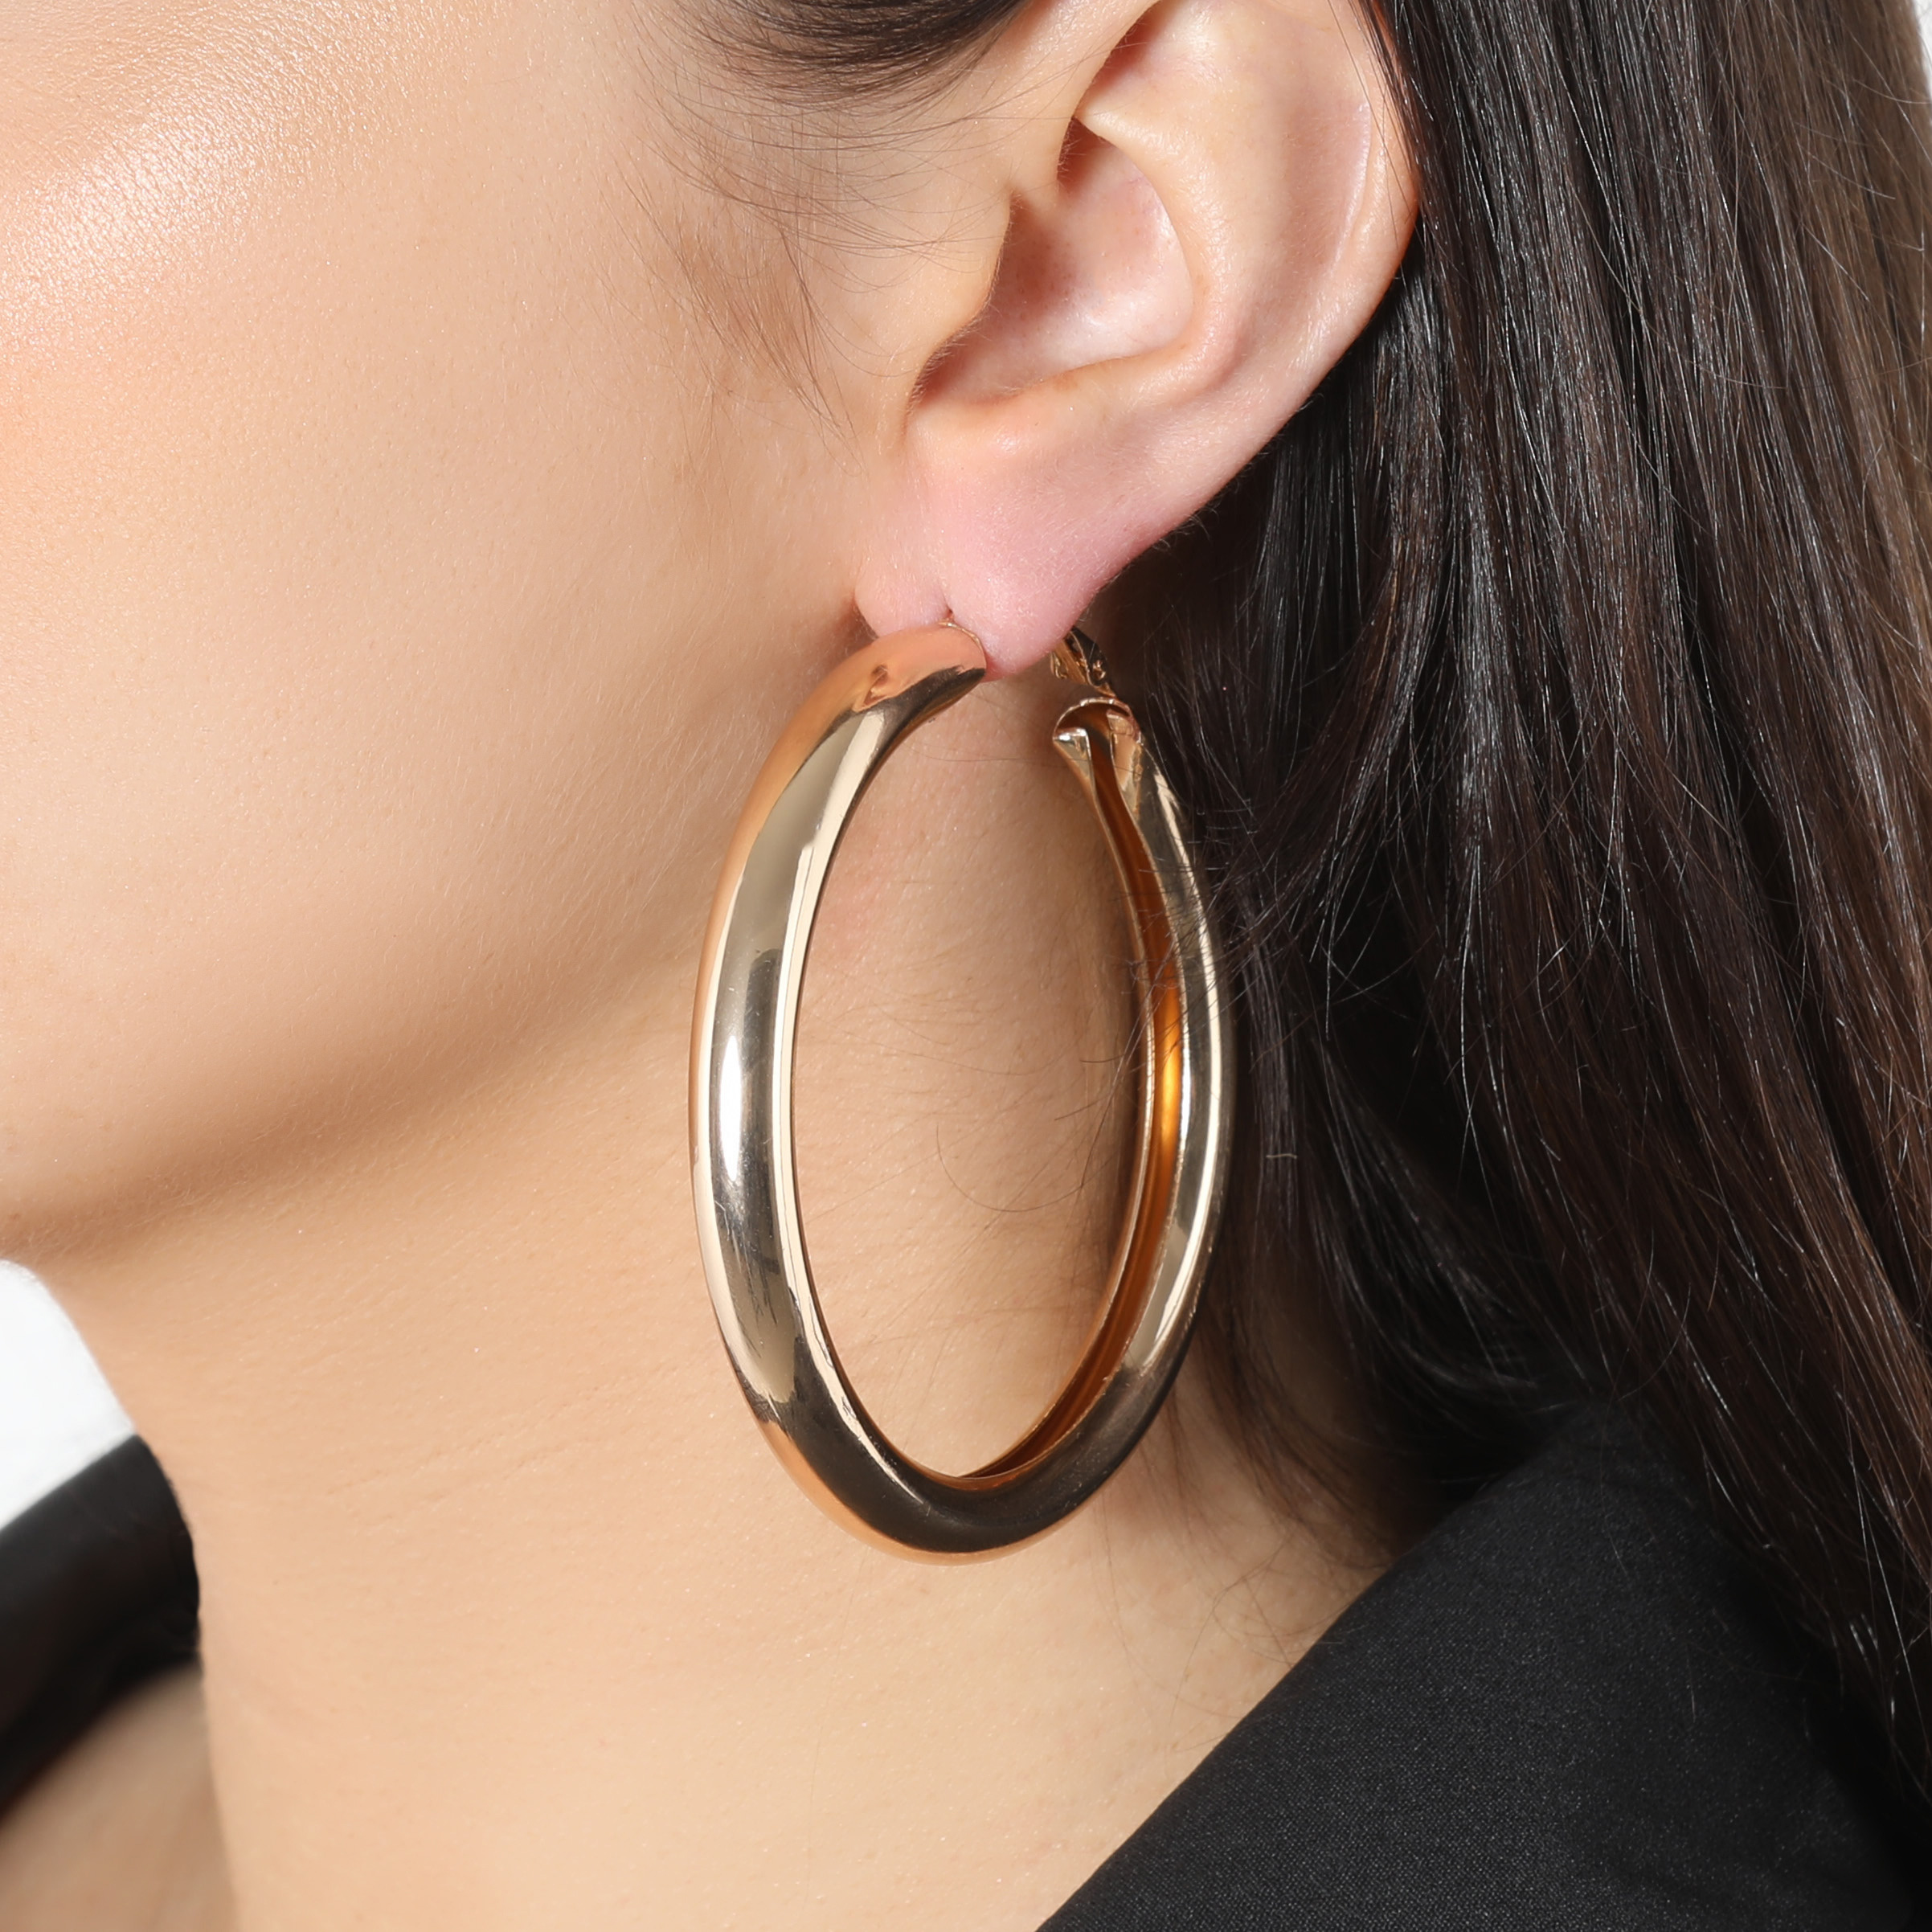 Small Hoop Earrings In Gold